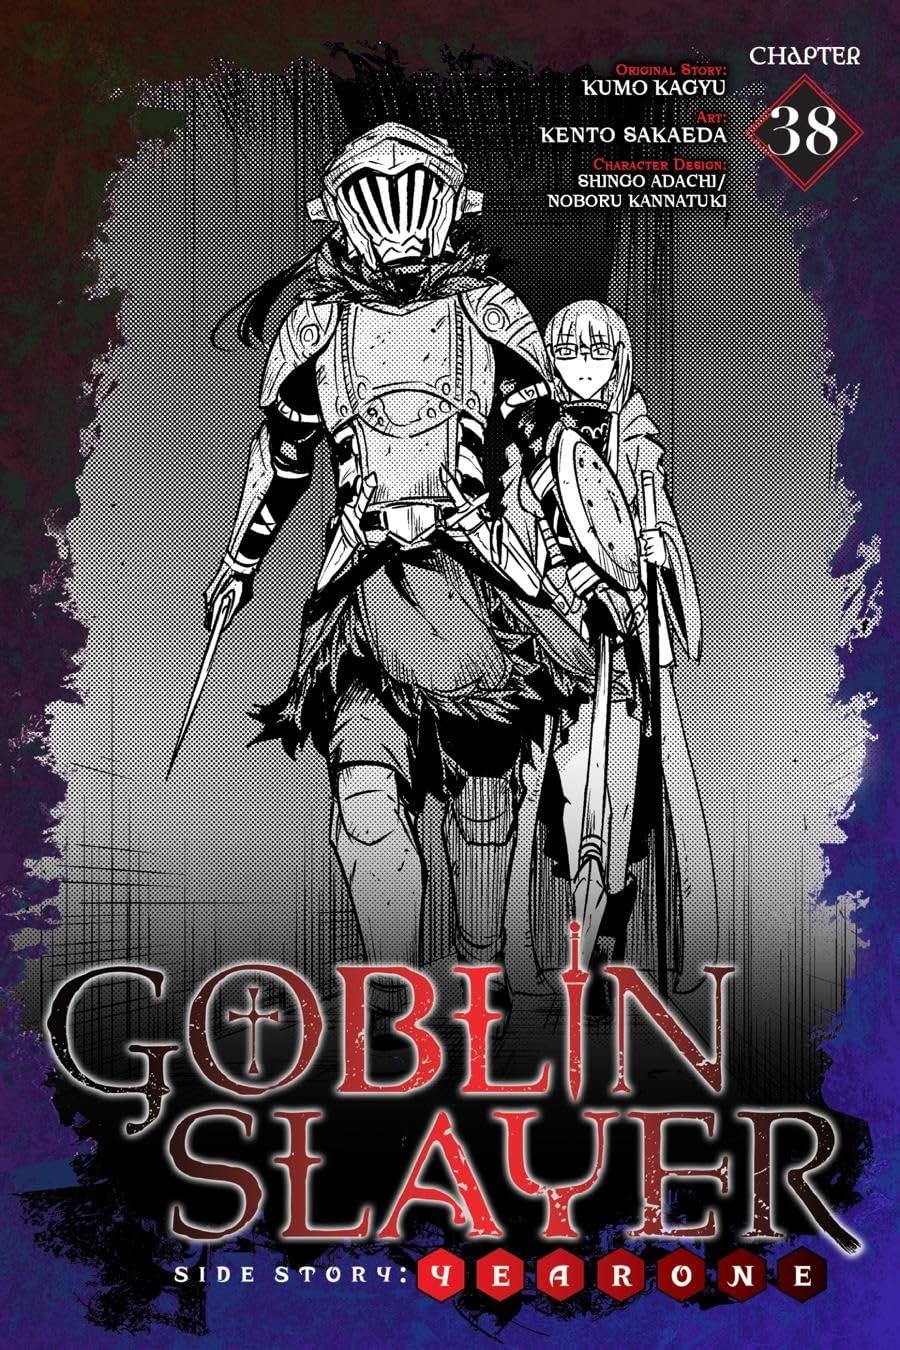 Goblin Slayer Side Story: Year One #38